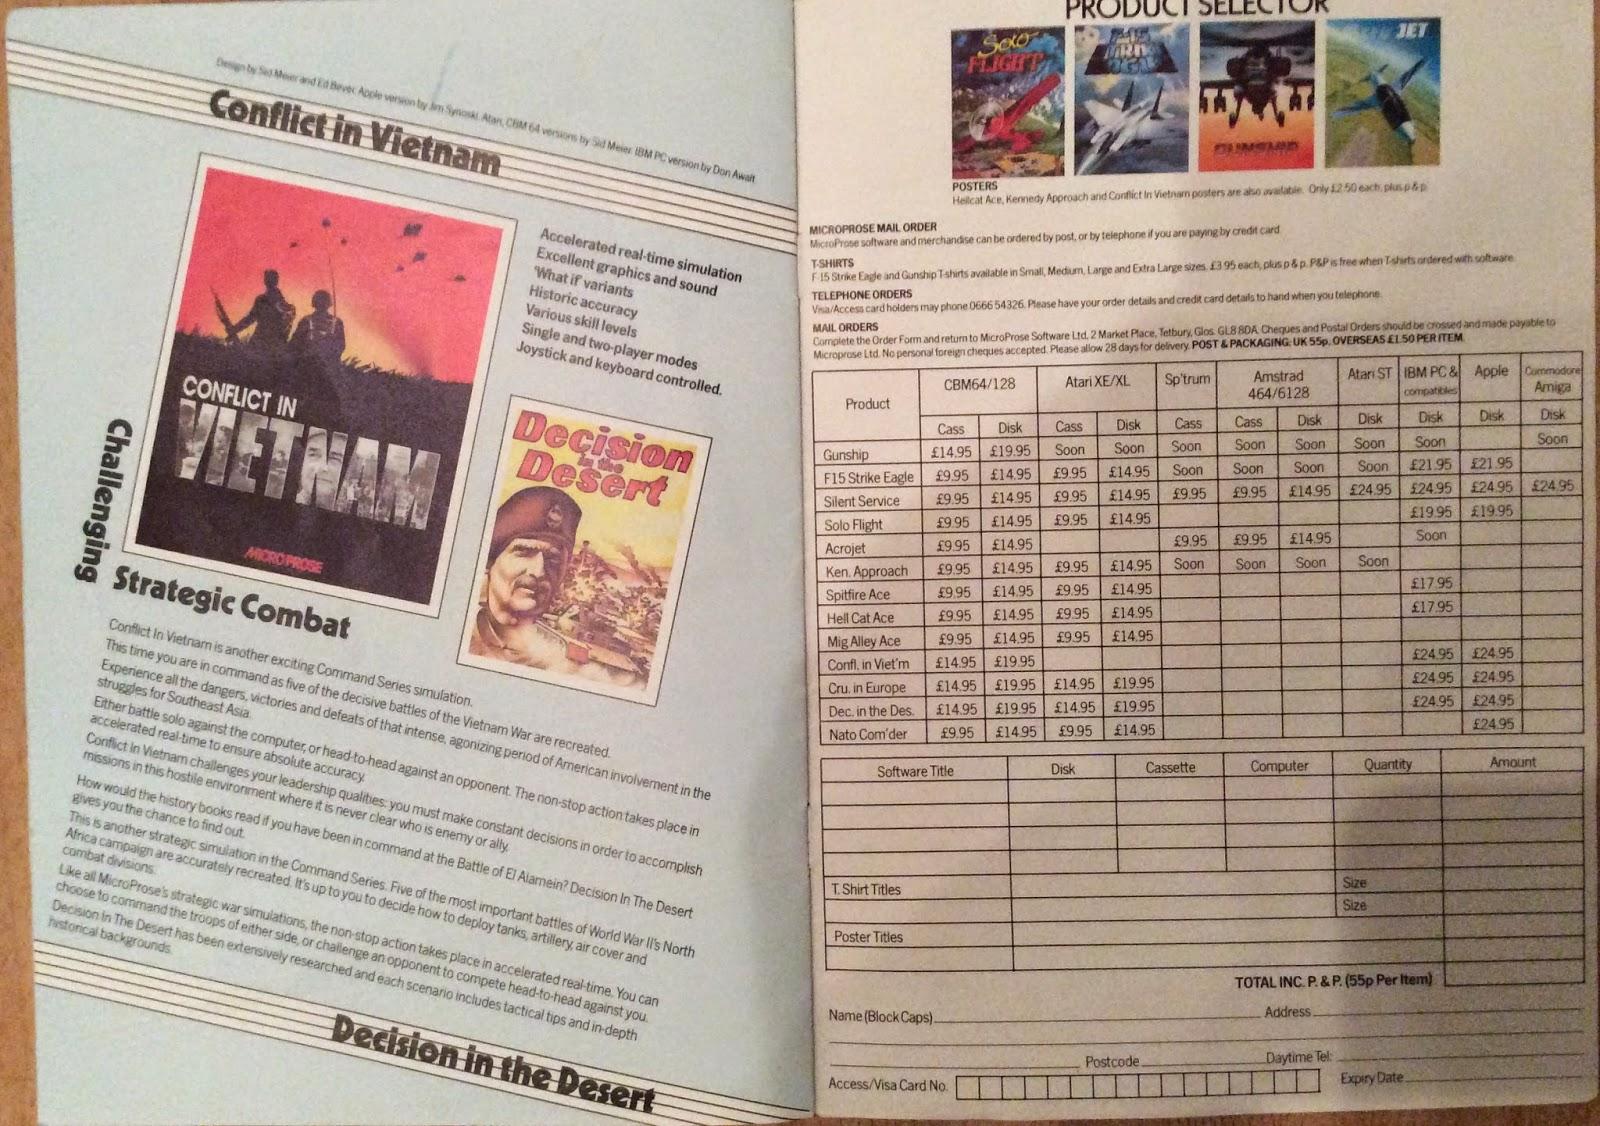 manual for conflict in vietnam c 64